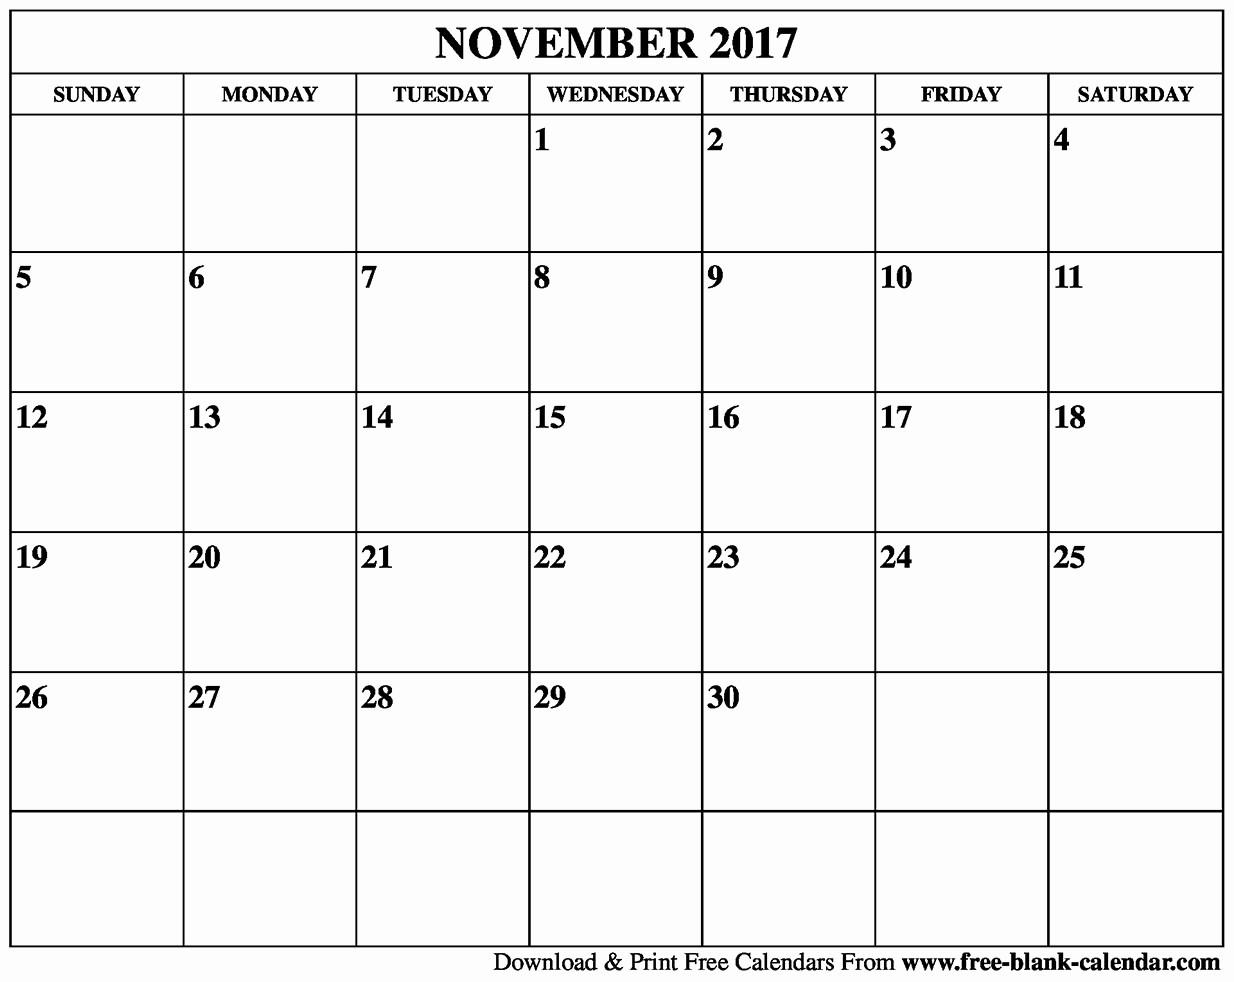 Blank November 2017 Calendar Template Fresh Blank November 2017 Calendar Printable